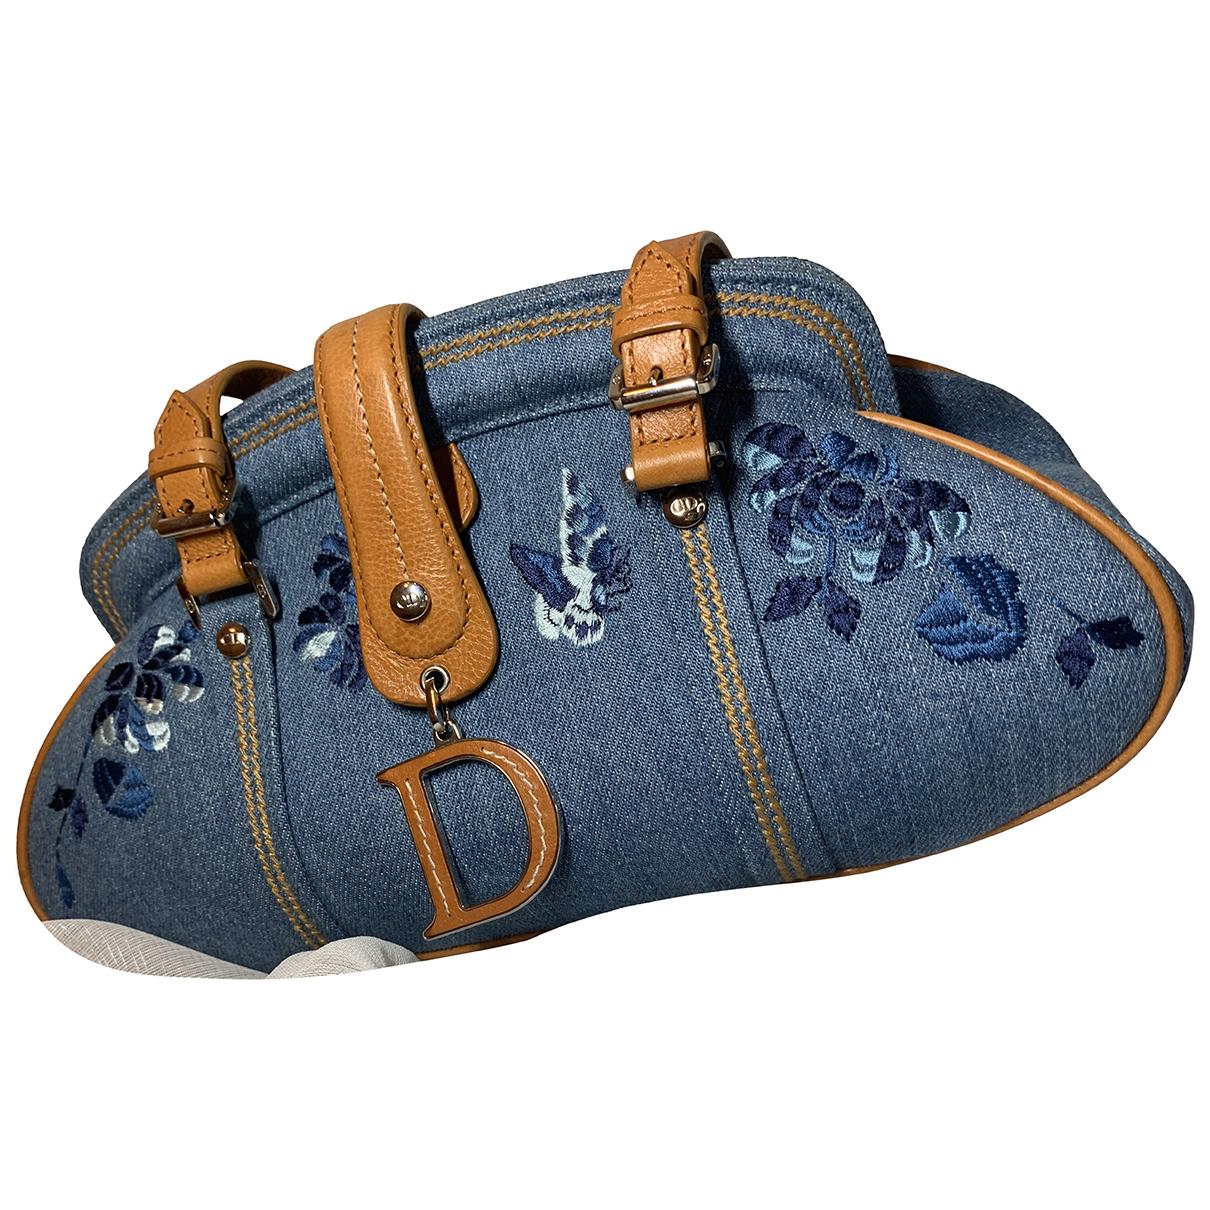 Dior \N Blue Denim - Jeans handbag for Women \N